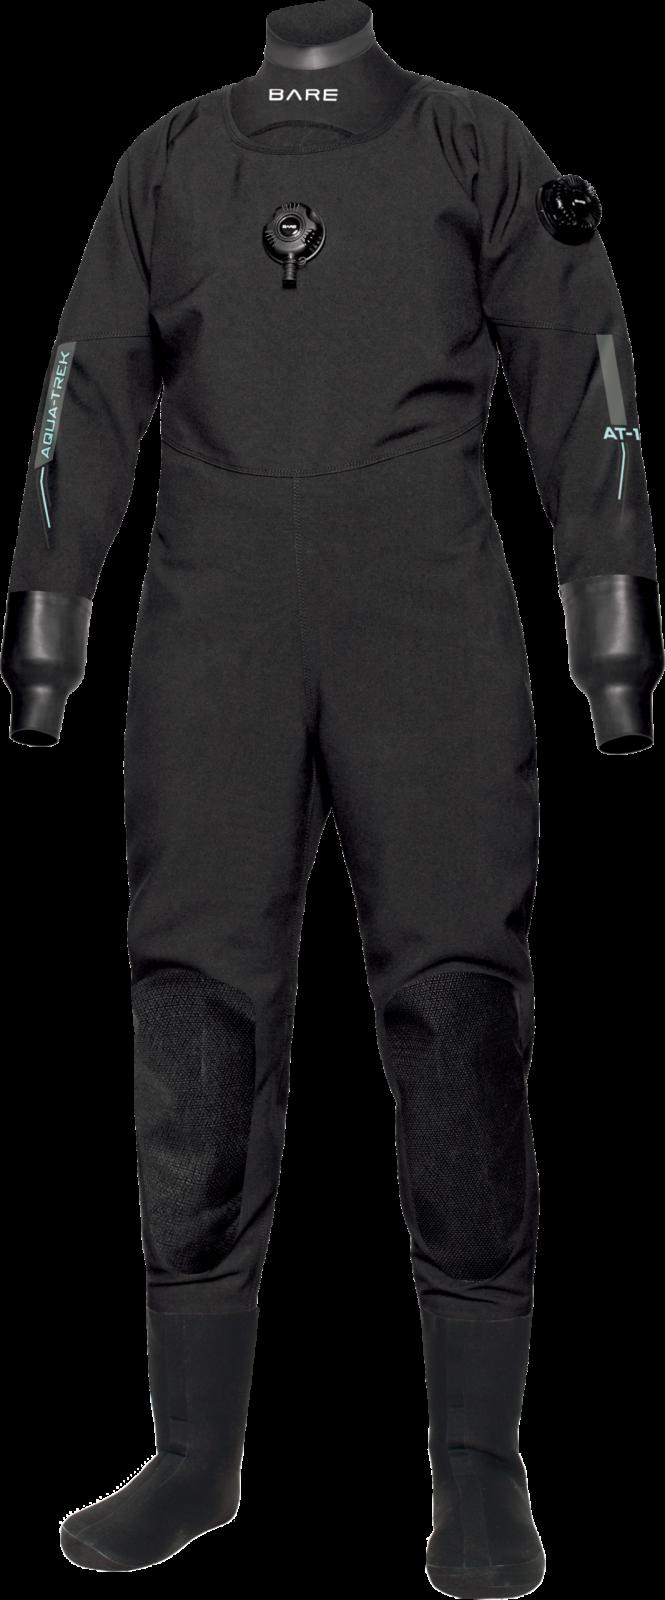 Bare Aqua-Trek 1 Pro Dry Women's Drysuit